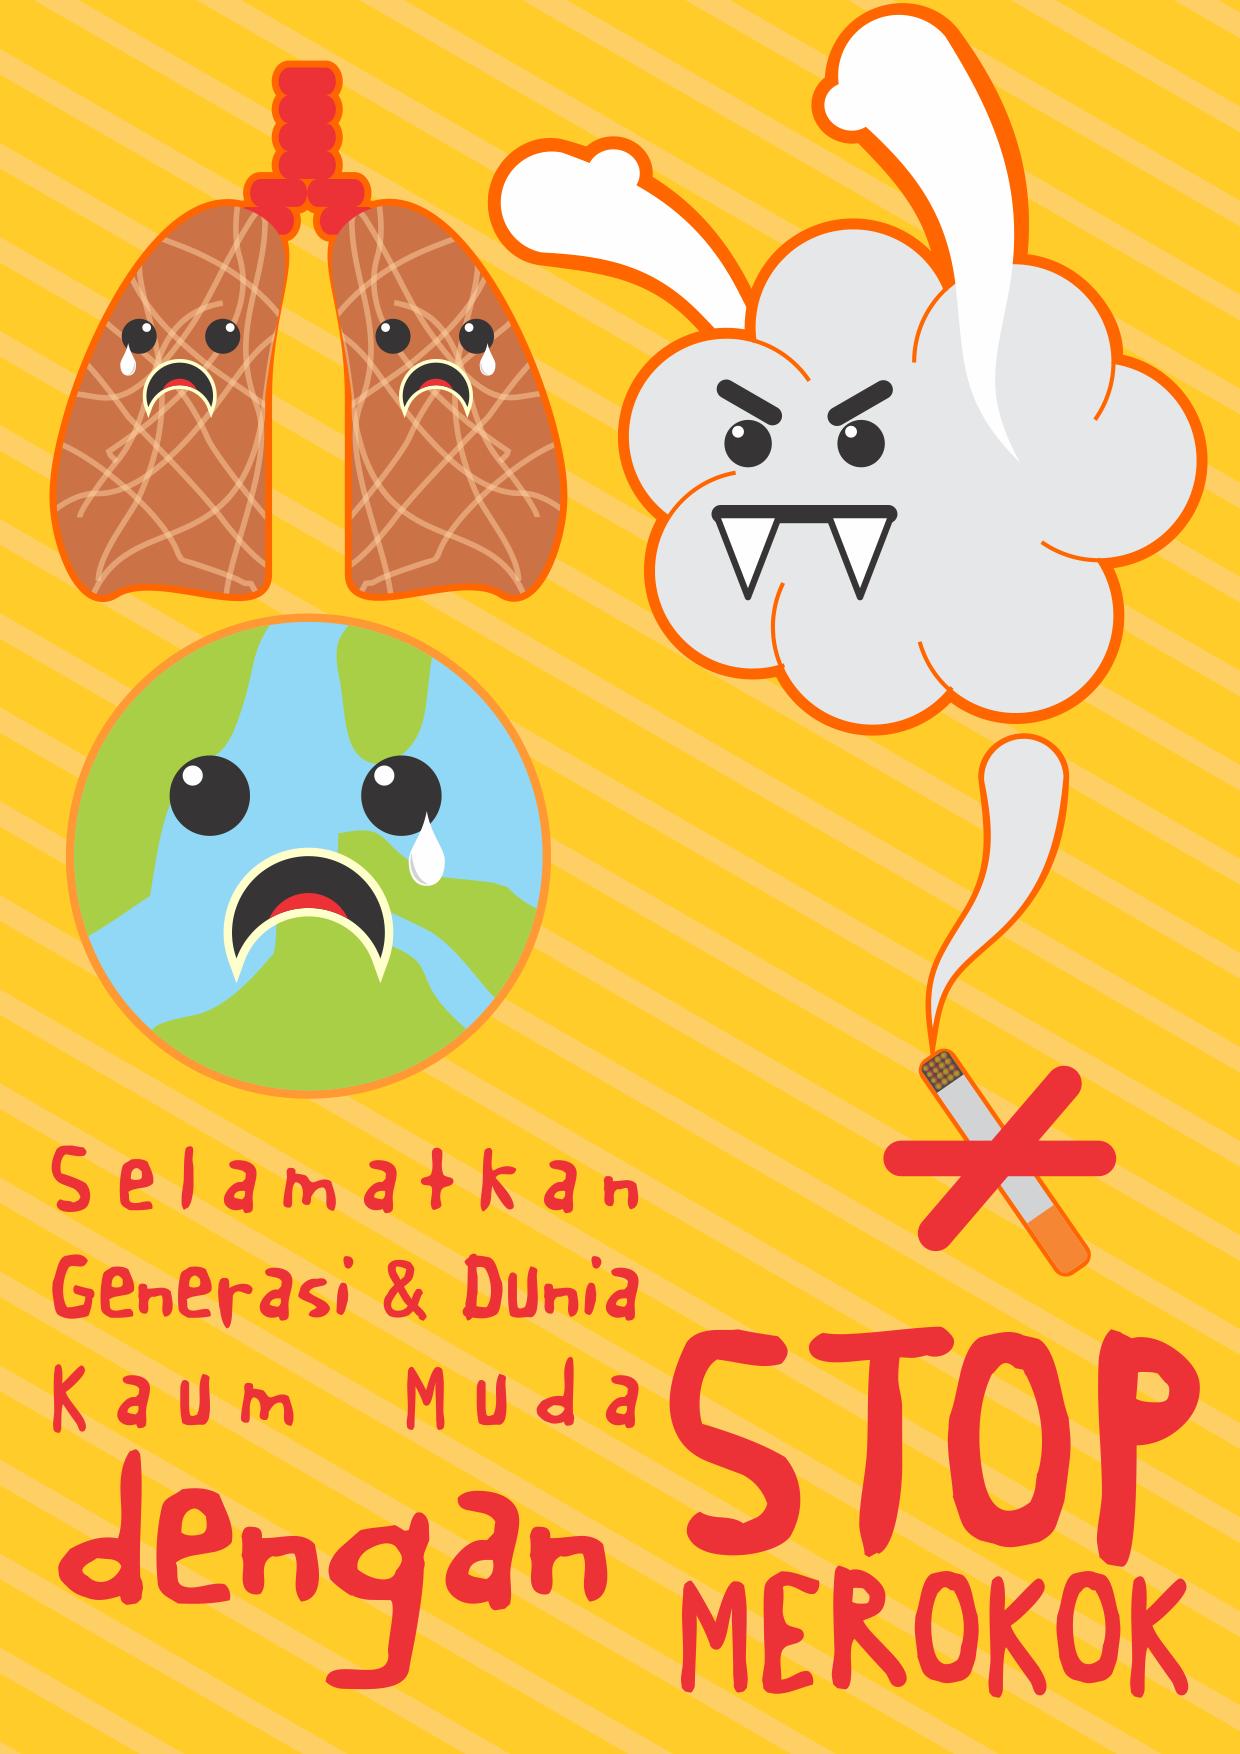 Bahaya Merokok Gambar Animasi Dapatkan Inspirasi Untuk Poster Bahaya Merokok Kartun Koleksi Poster